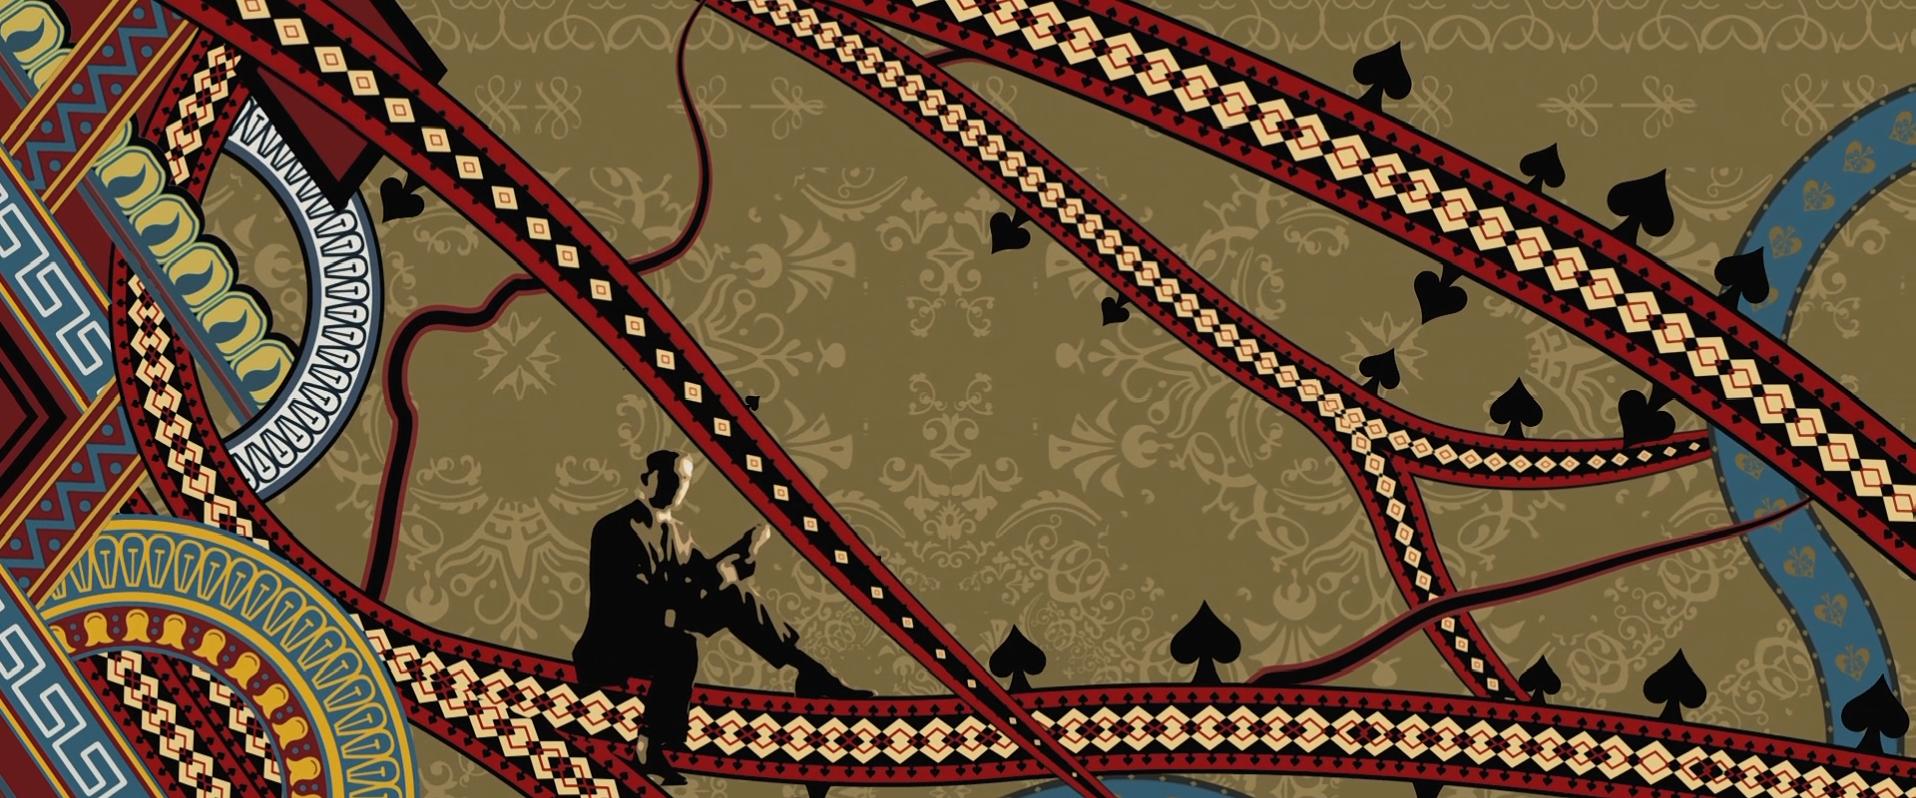 Casino royal intro 11